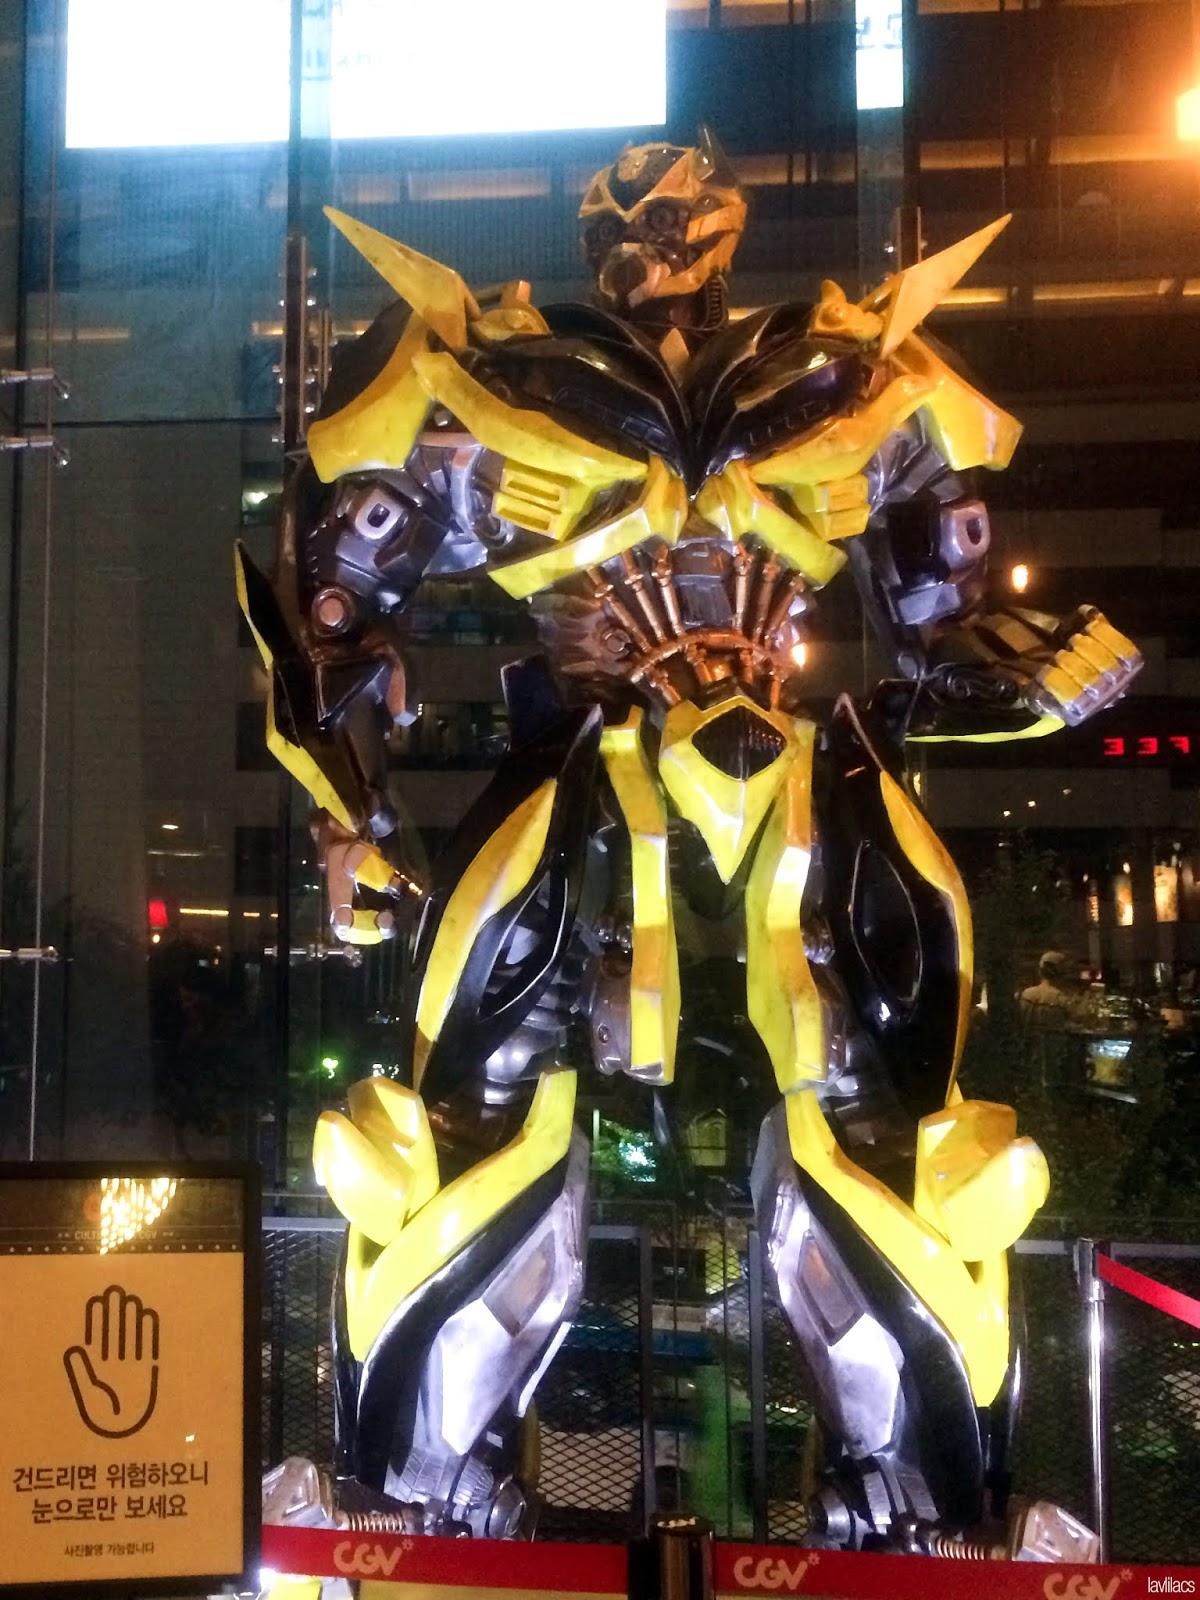 Seoul, Korea - Summer Study Abroad 2014 - Sinchon CGV Movie Theater Cinema - Transformers statue figure